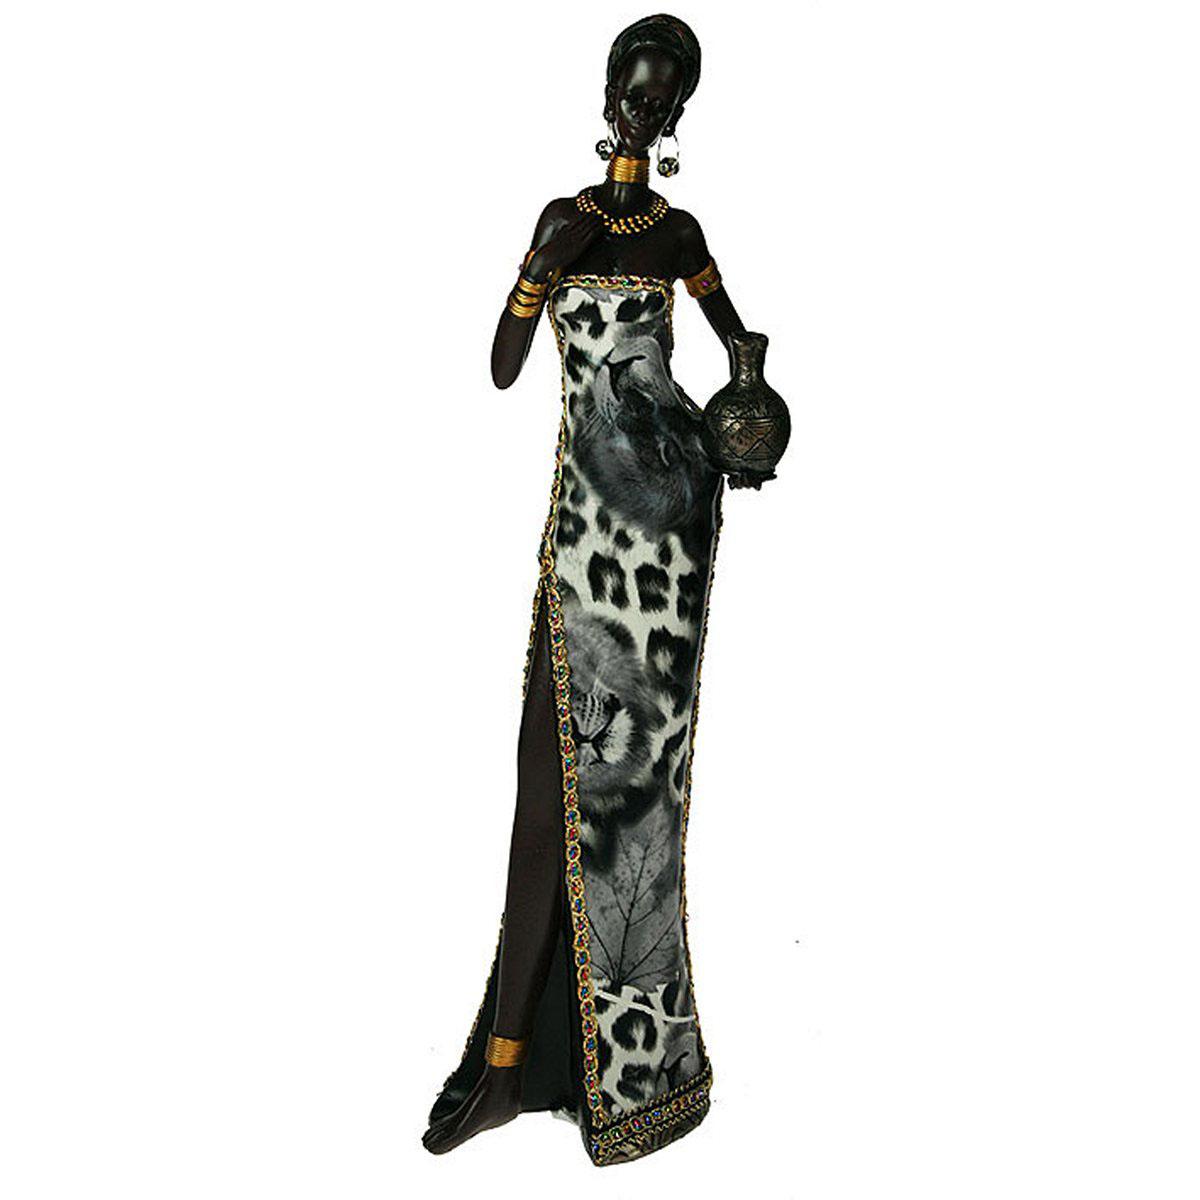 Статуэтка Русские Подарки Африканка, 14 х 8 х 43 см. 26118 статуэтка русские подарки мисс утонченность 12 х 10 х 34 см